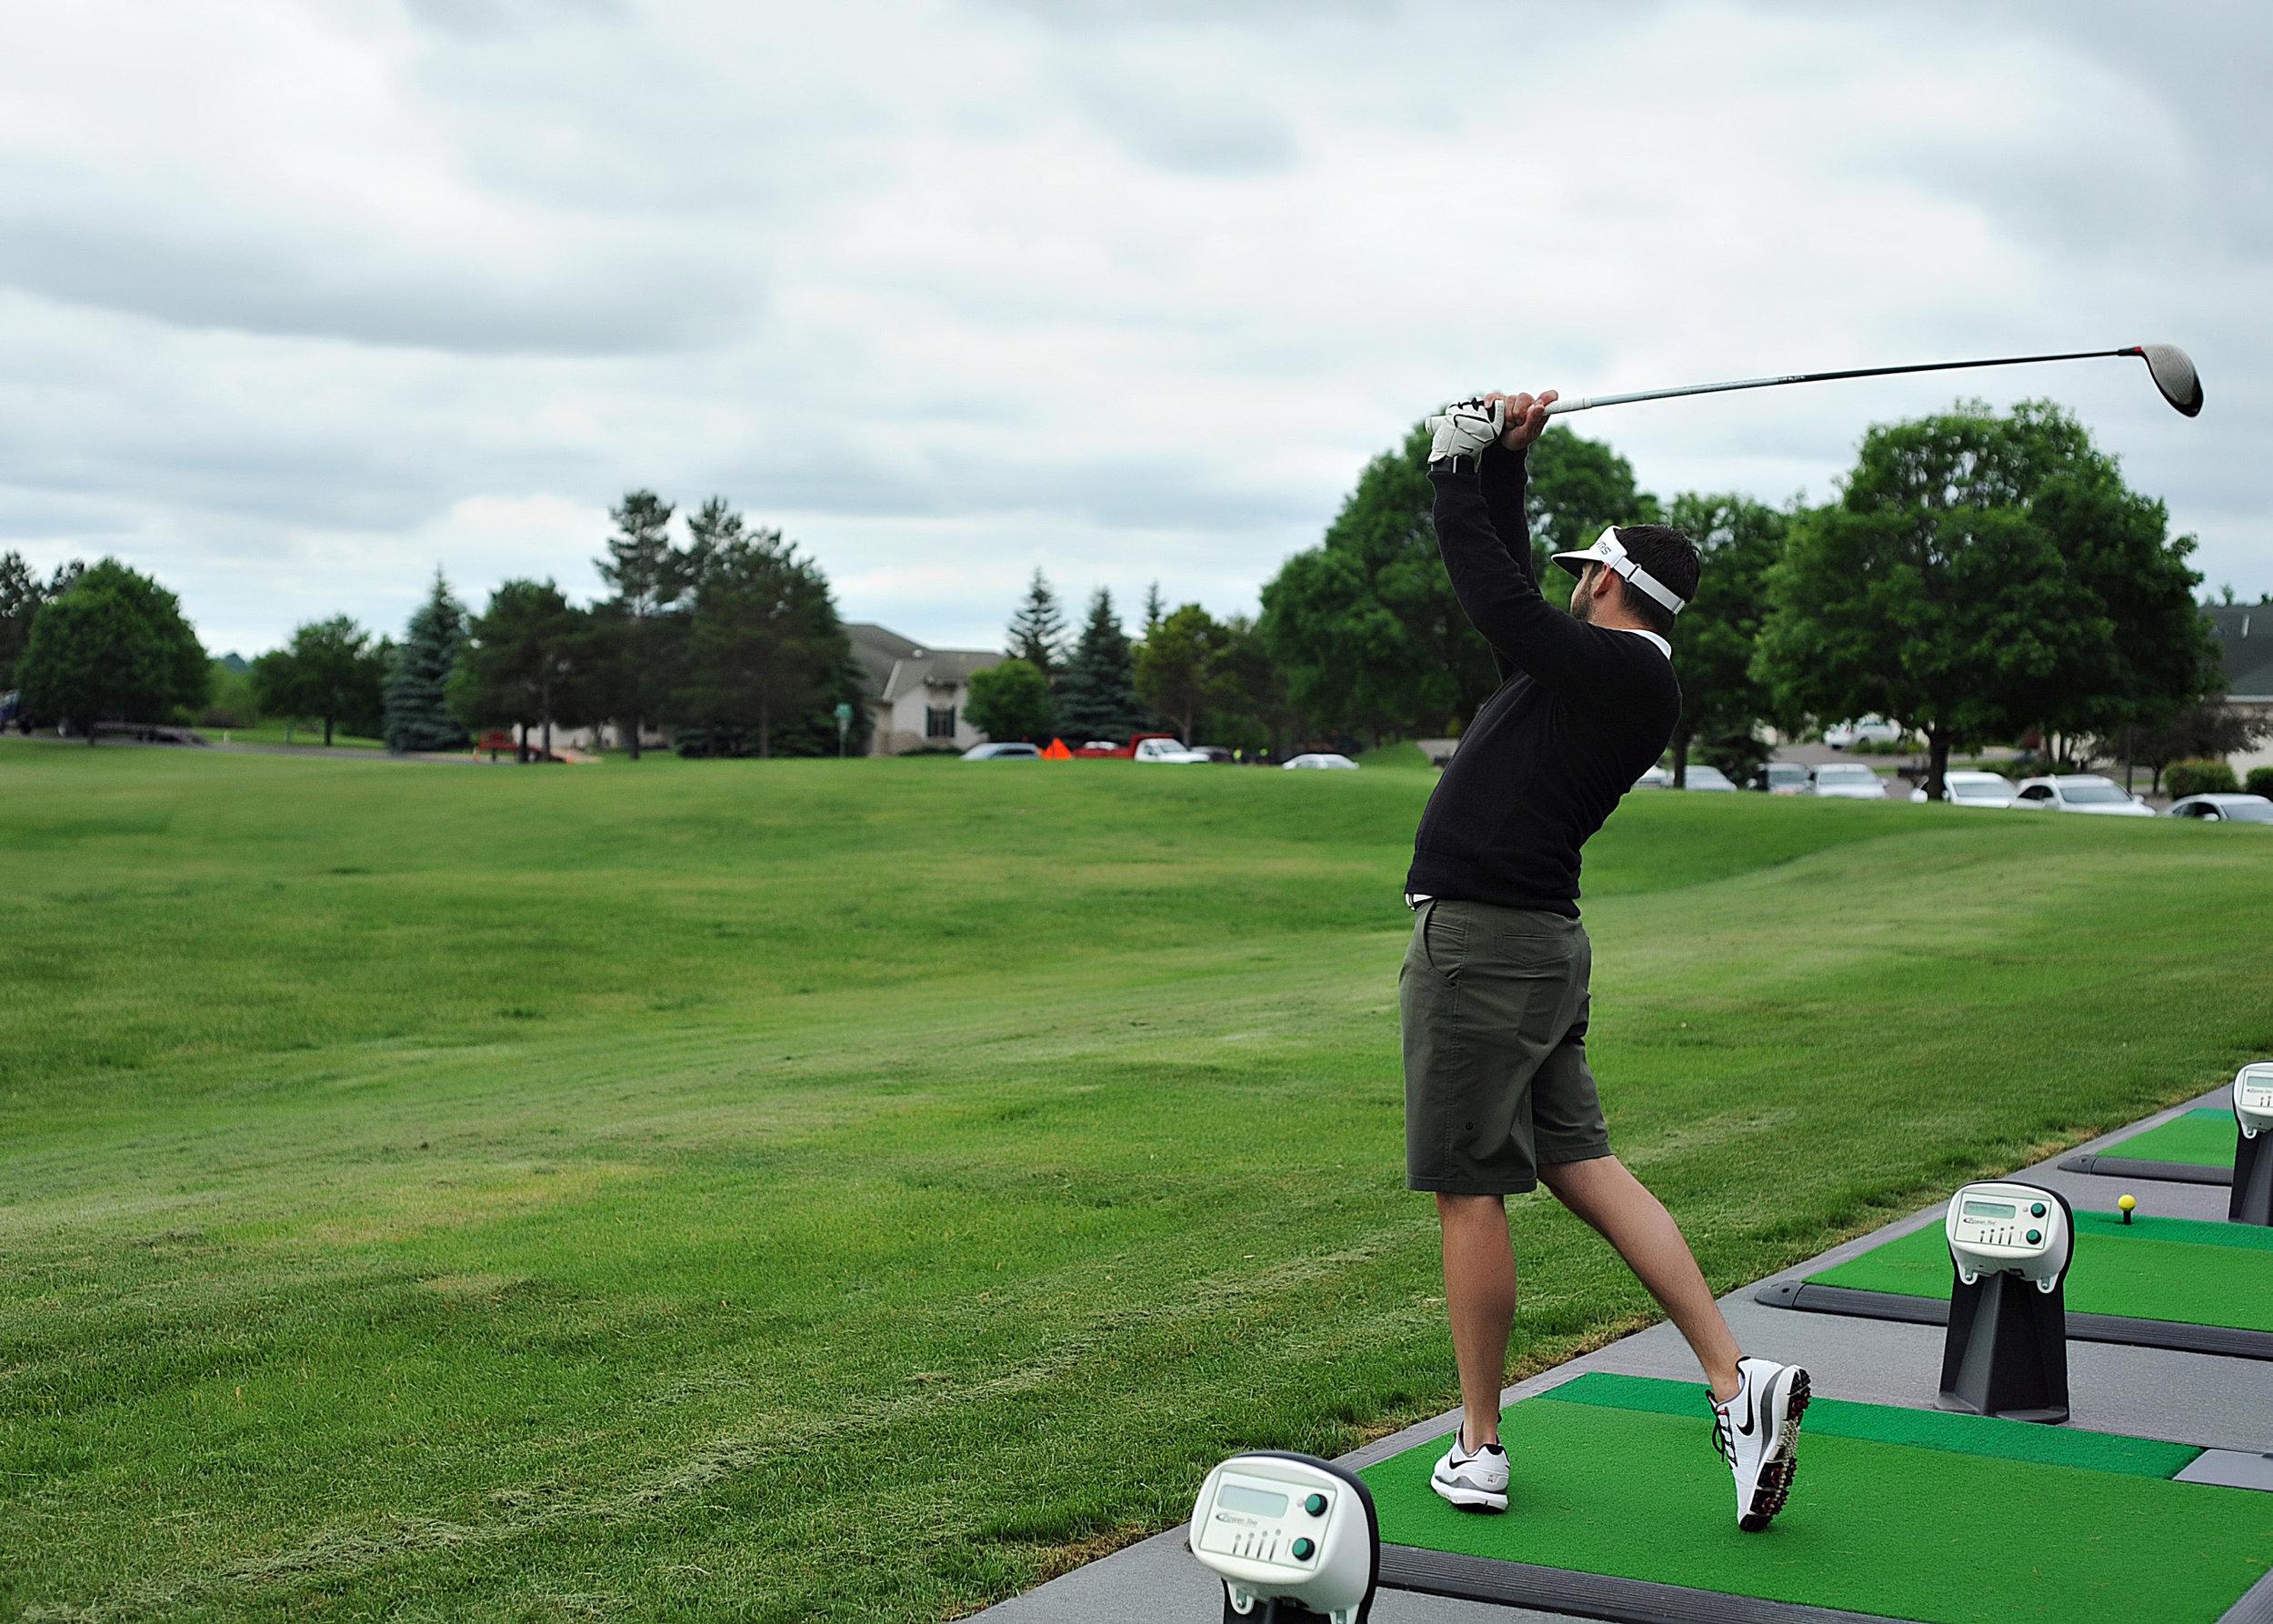 golfscramble_0005.jpg